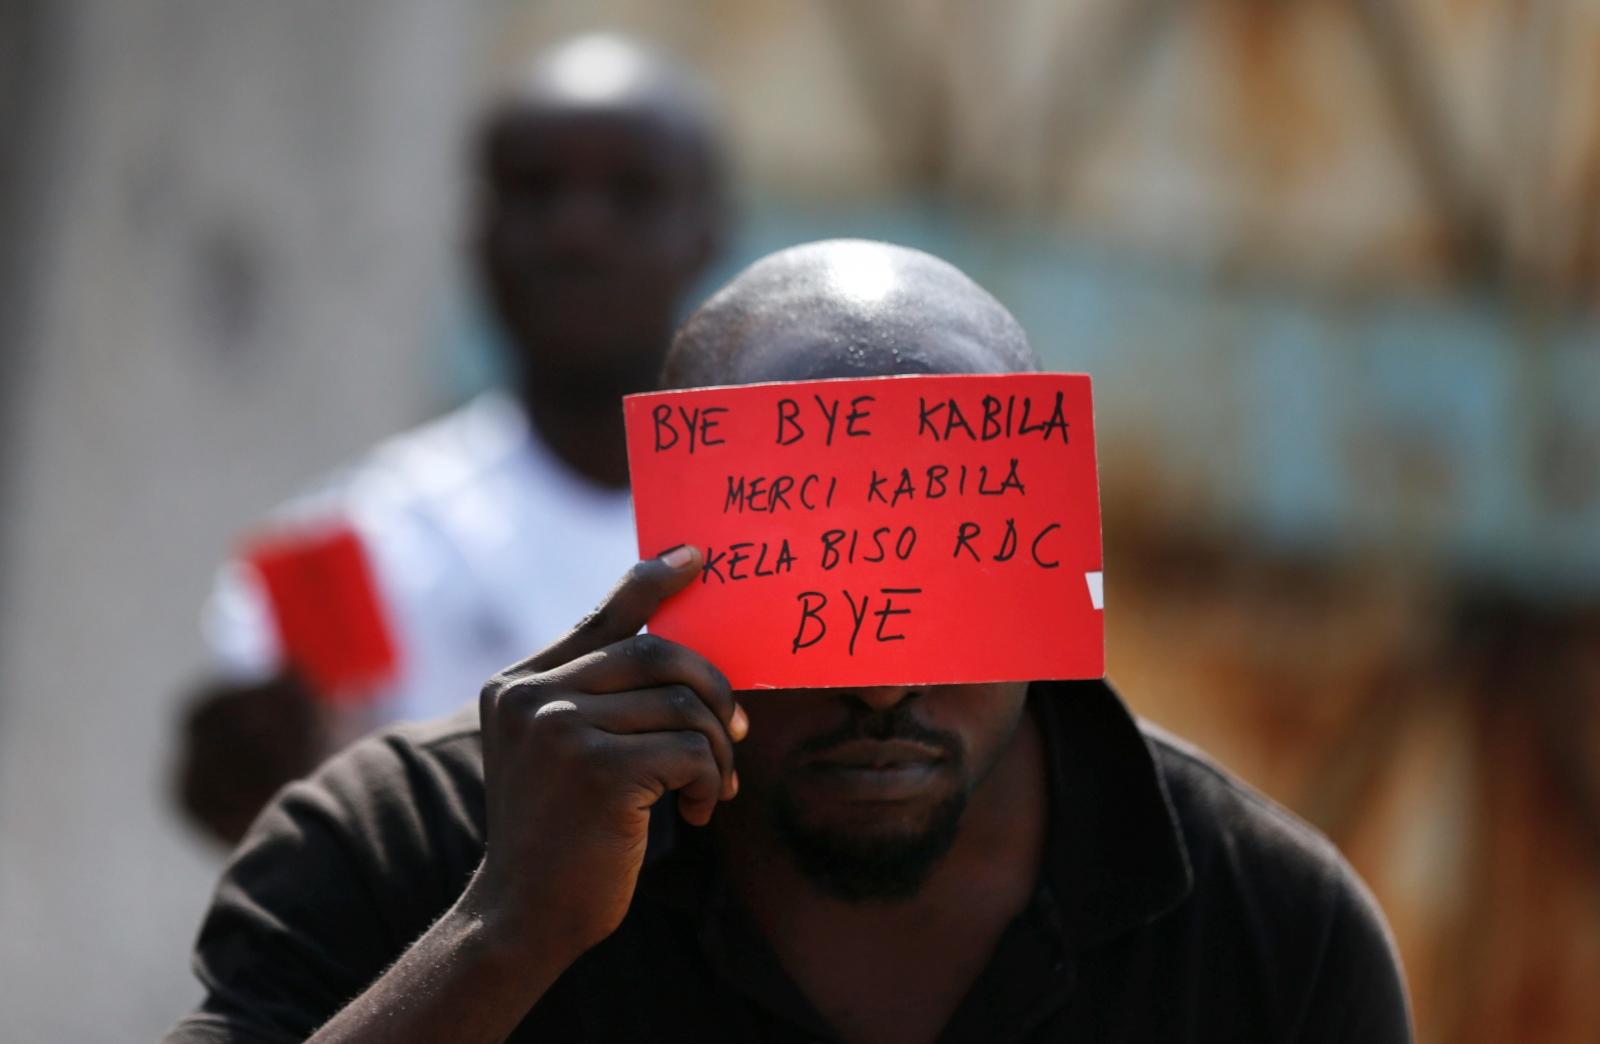 Kabila's red card